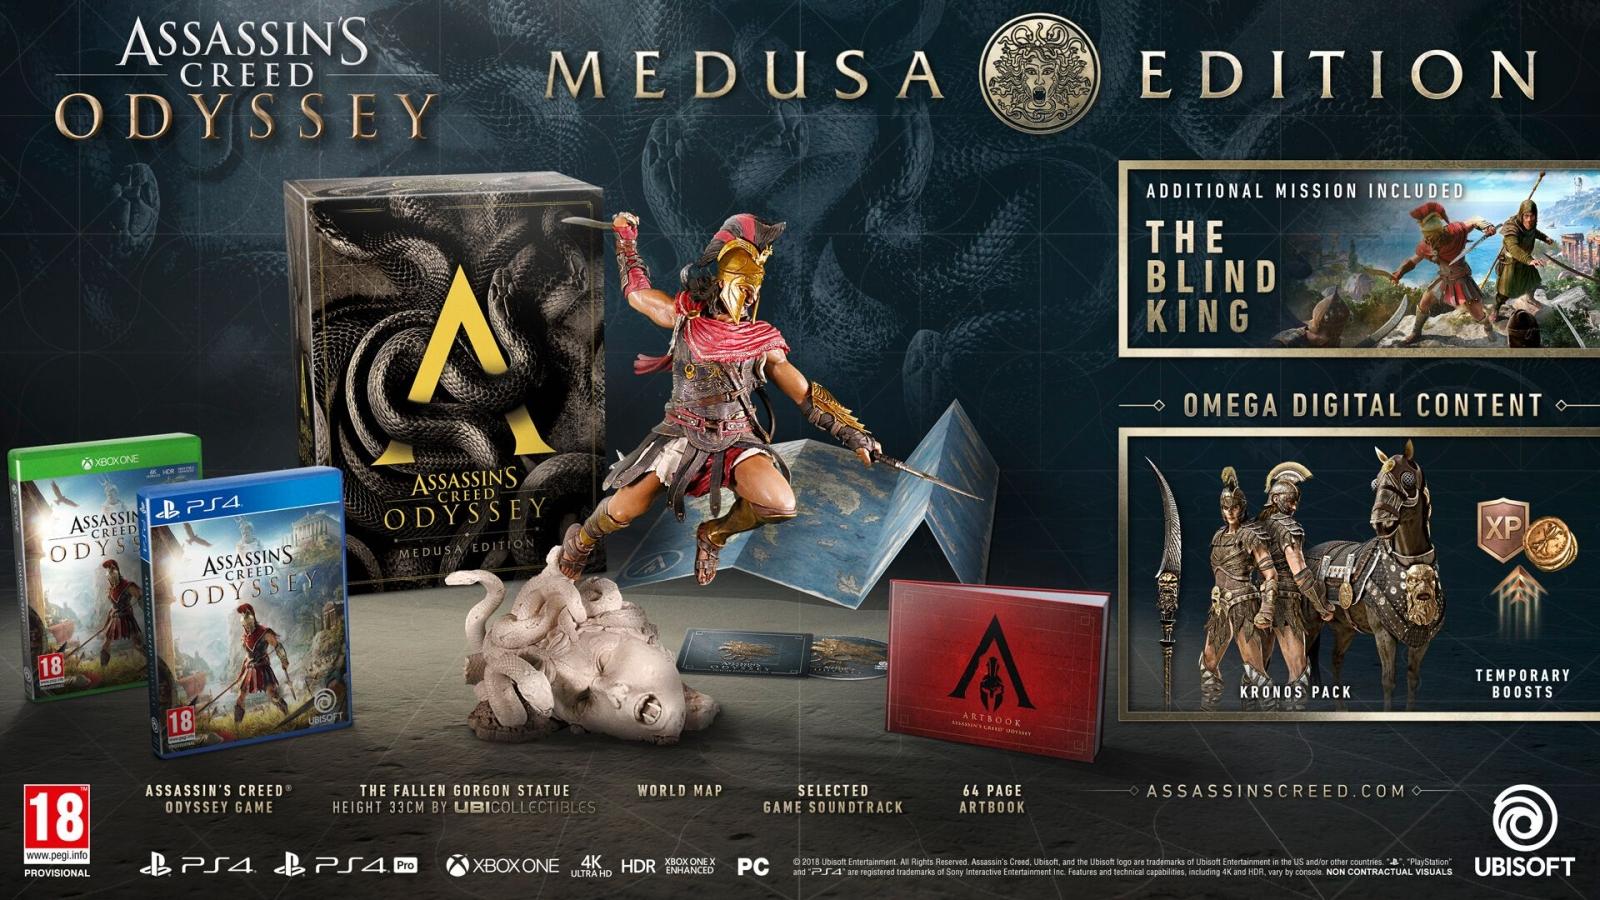 XBOXOne Assassin´s Creed Odyssey Medusa Edition